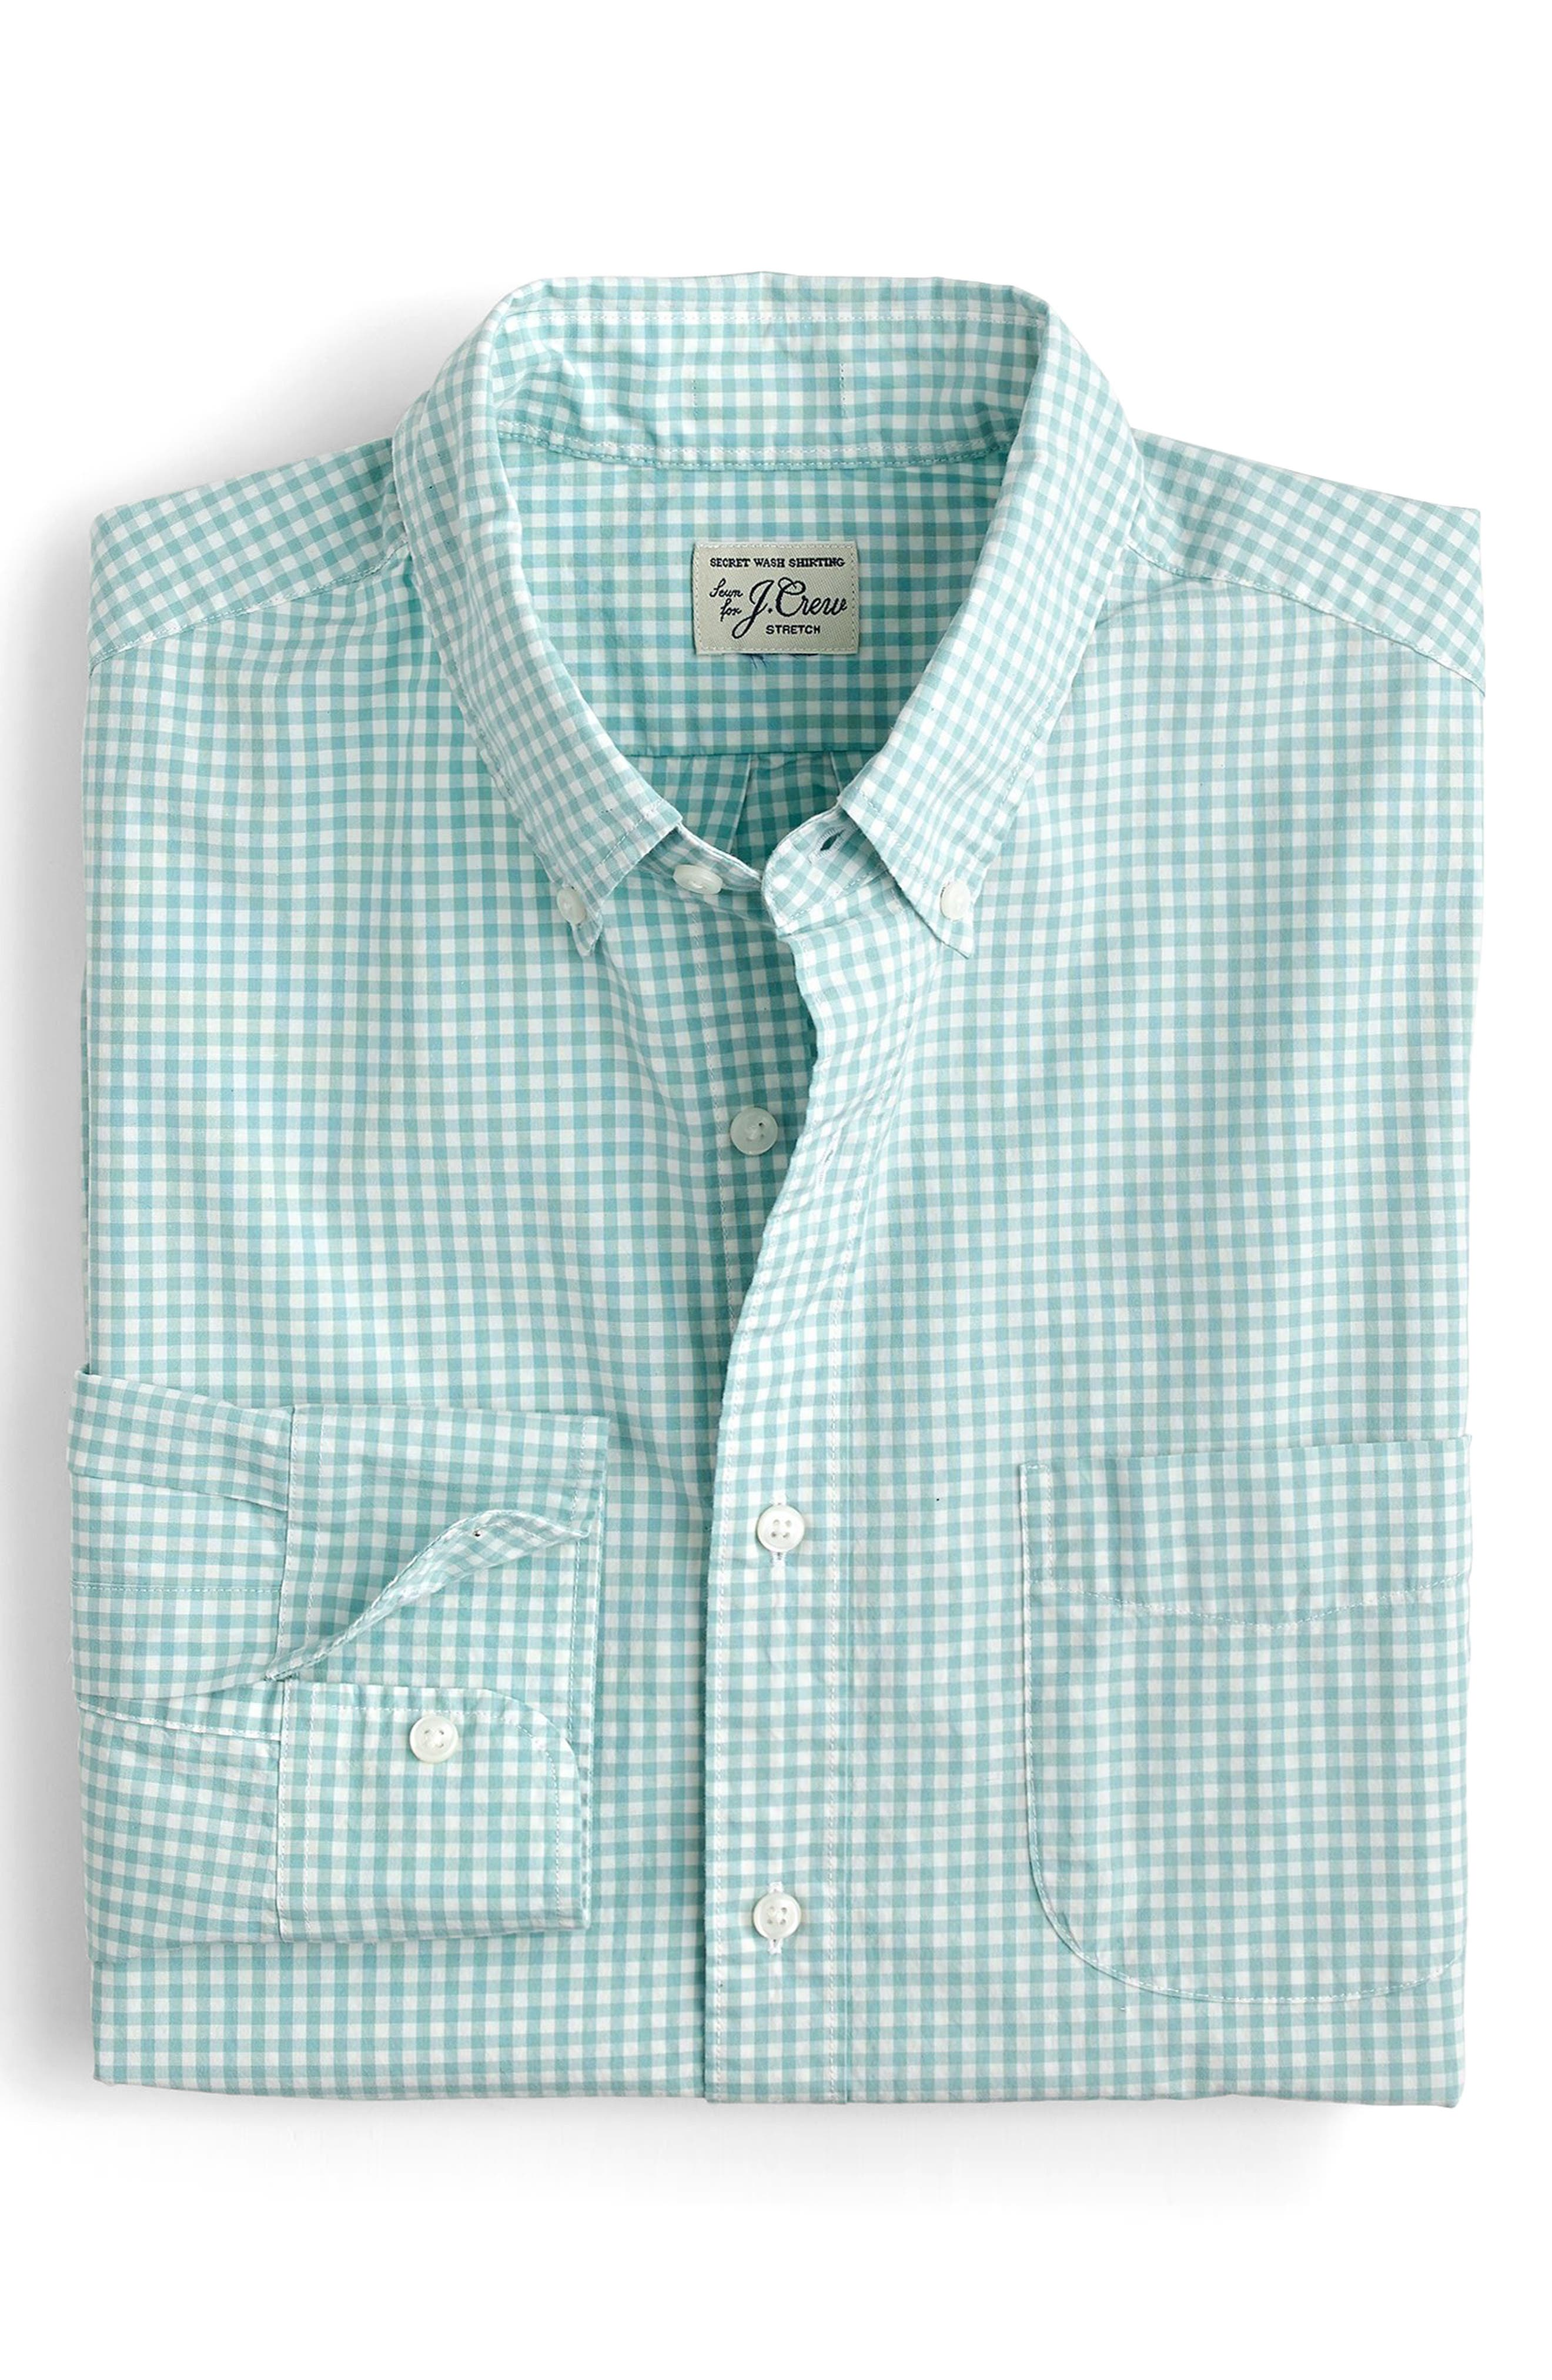 J.Crew Slim Fit Stretch Secret Wash Gingham Sport Shirt